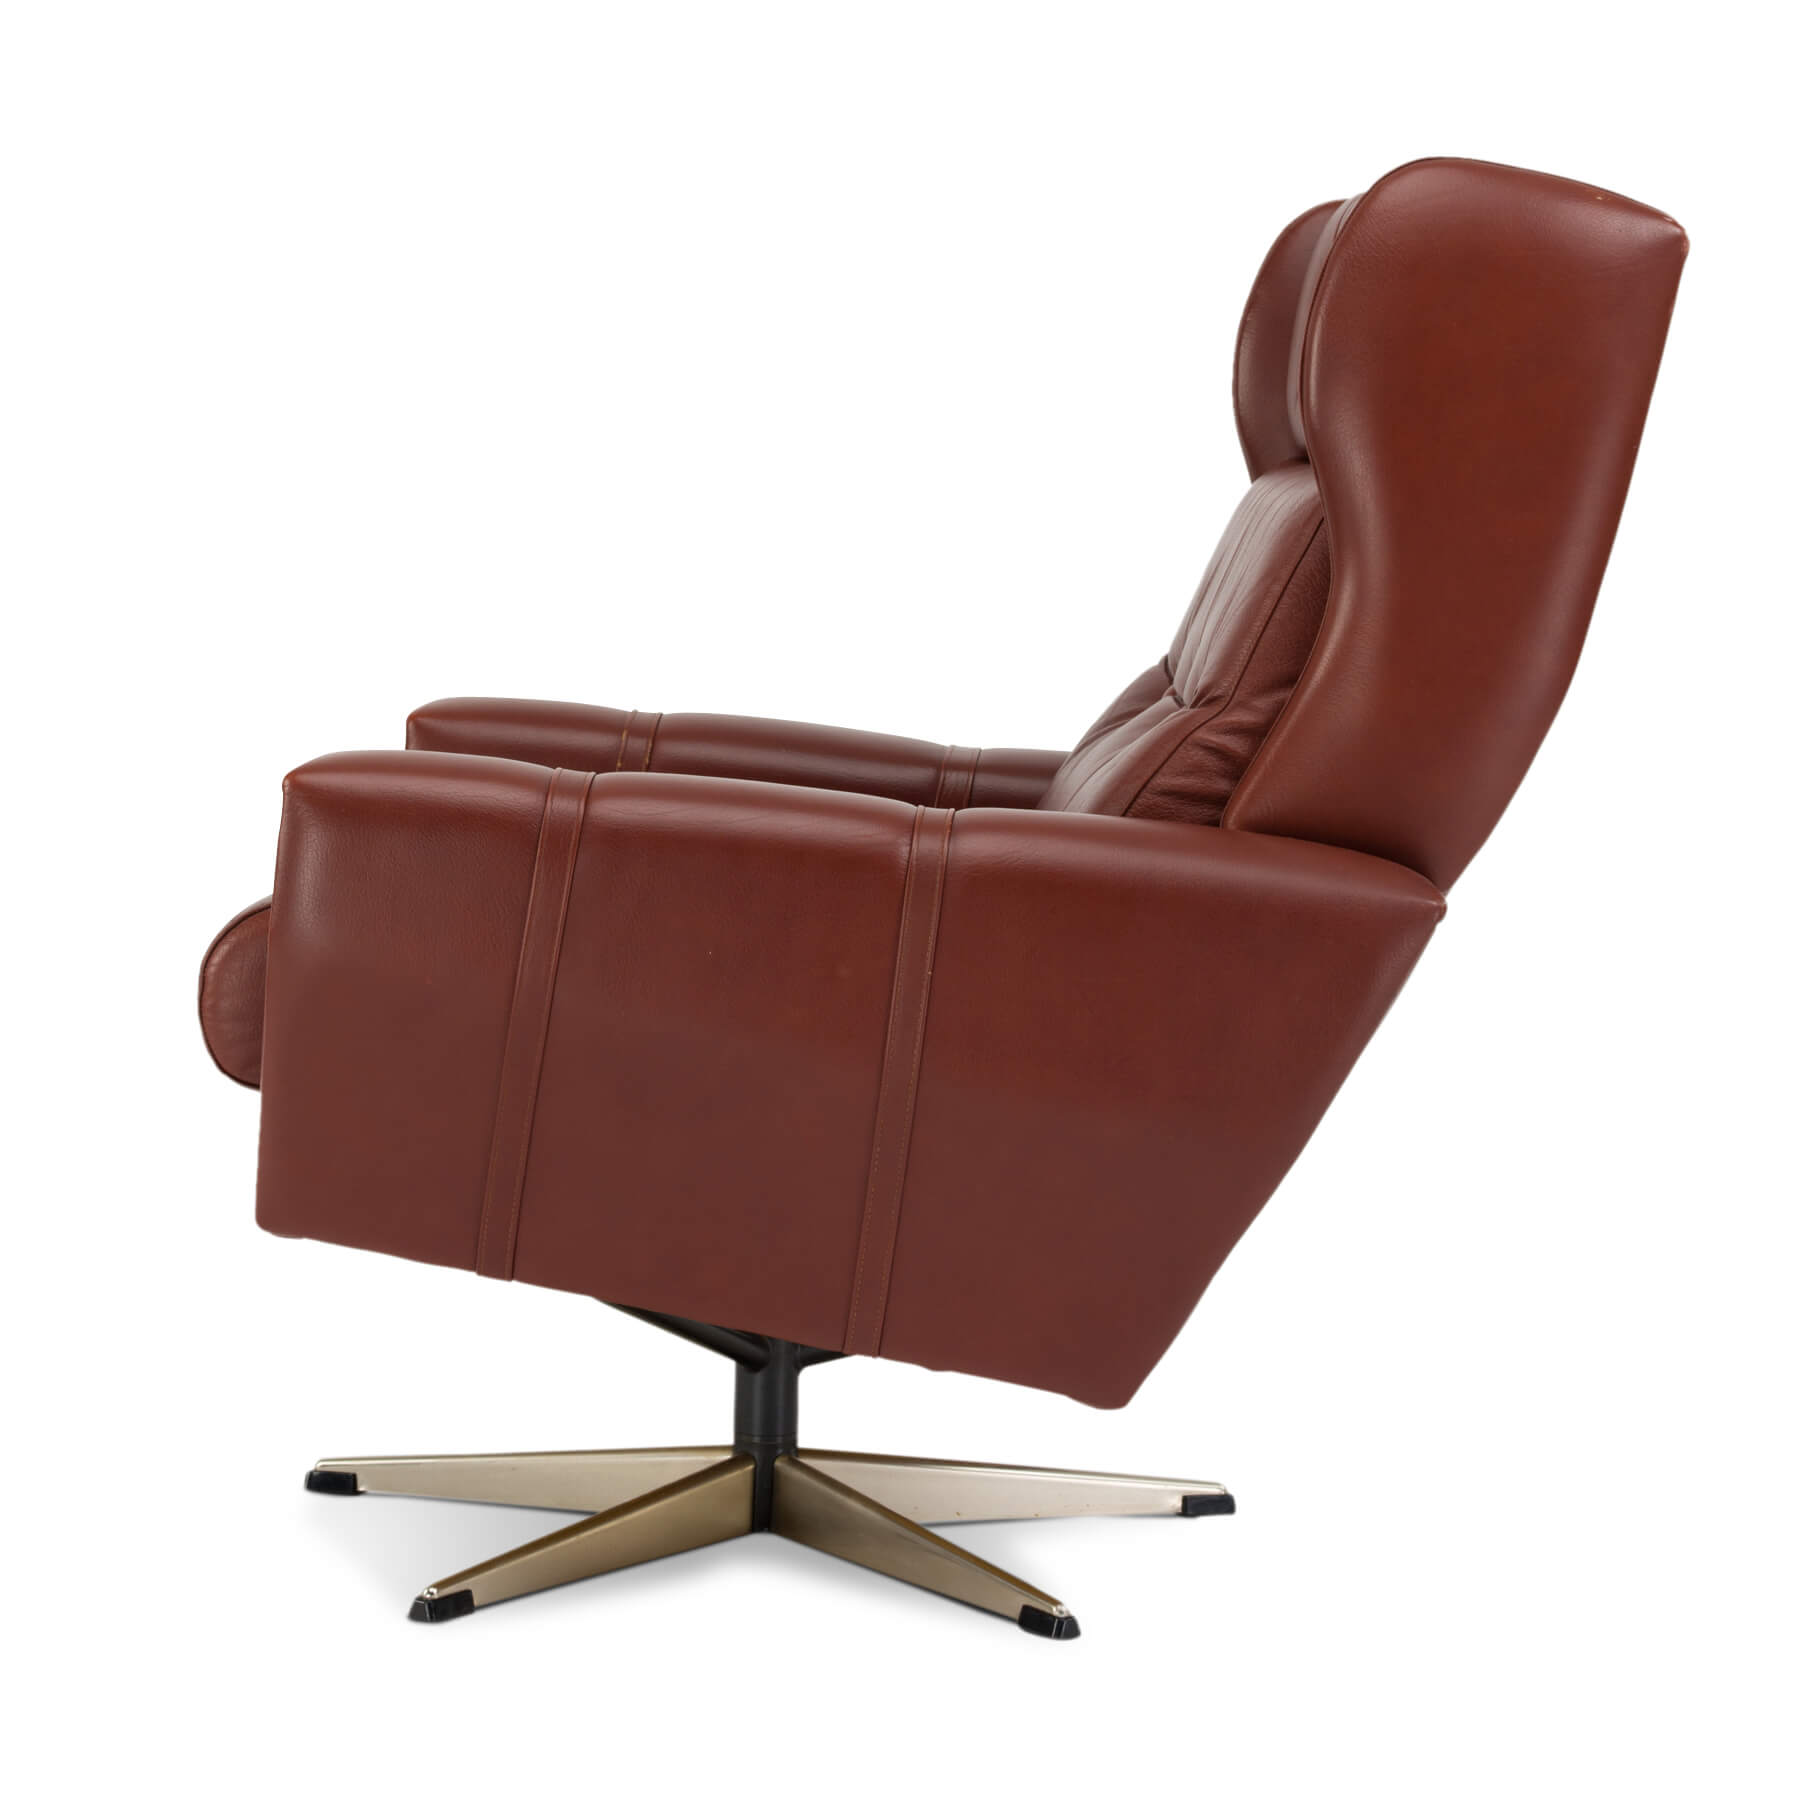 Miraculous Danish Leather Swivel Chair Furnip Pdpeps Interior Chair Design Pdpepsorg